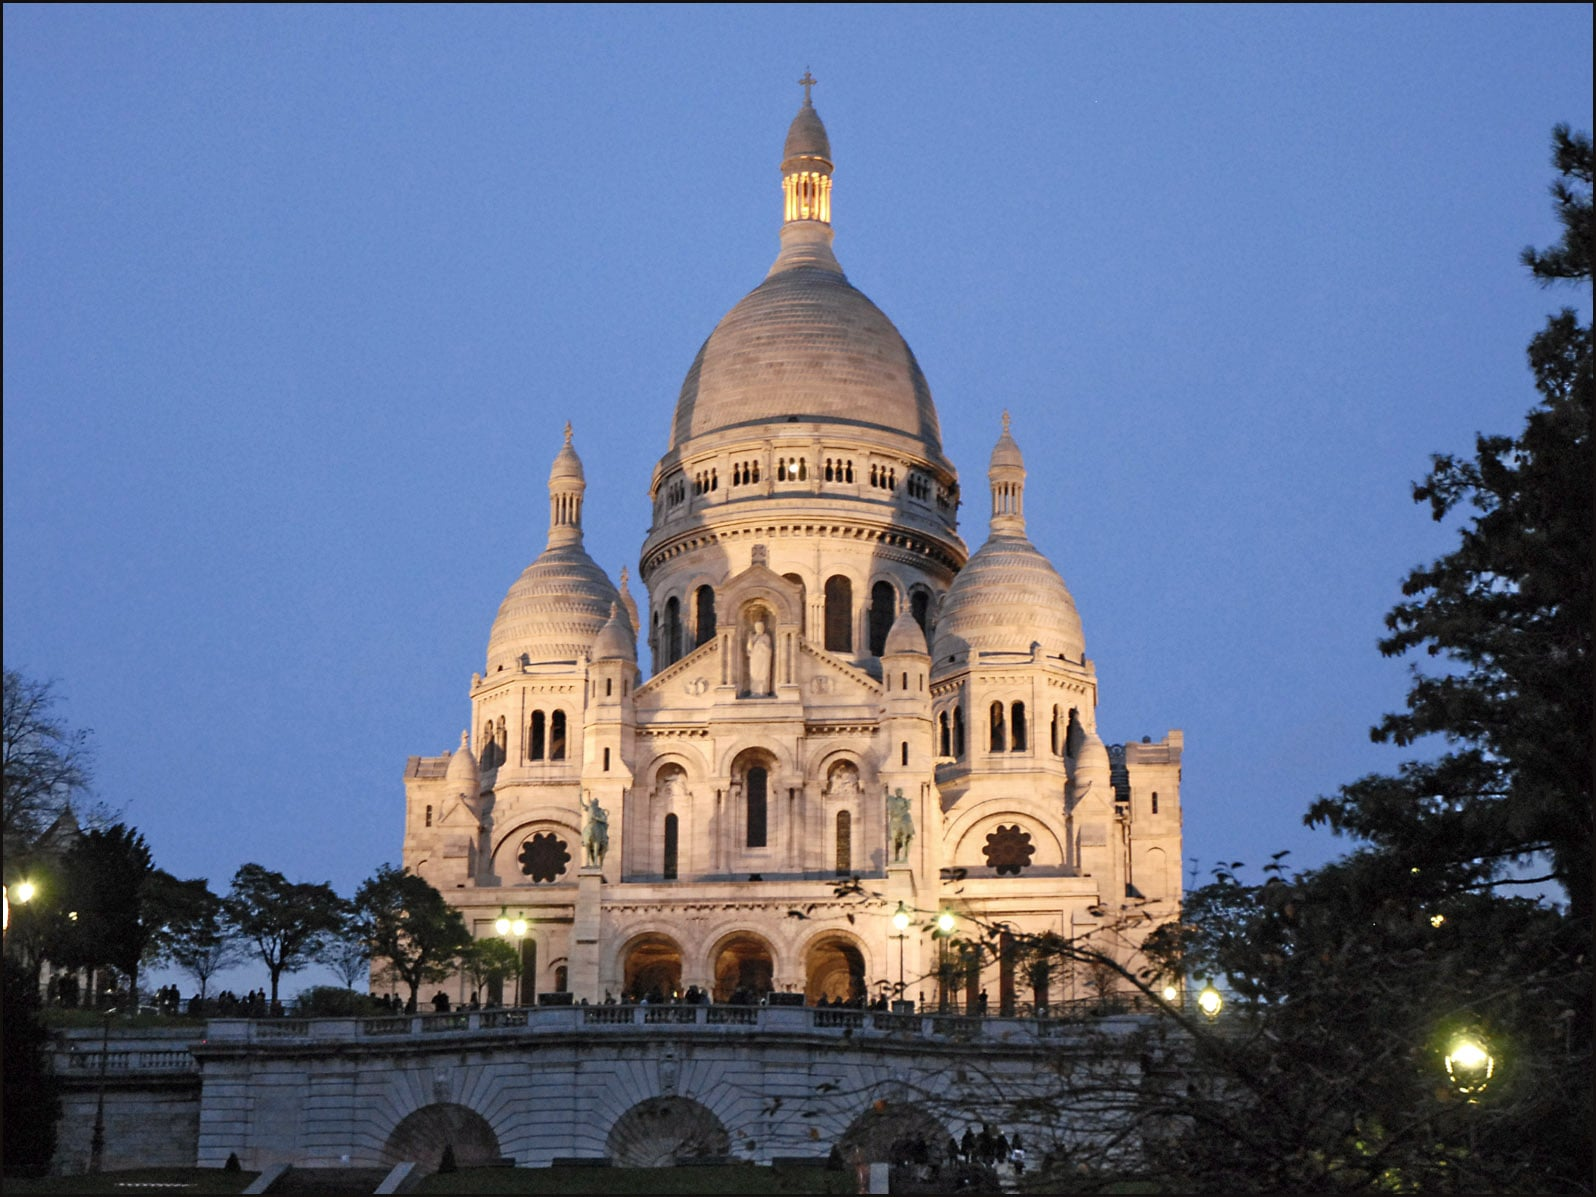 paris-sacre-coeur-basilica-secret-world